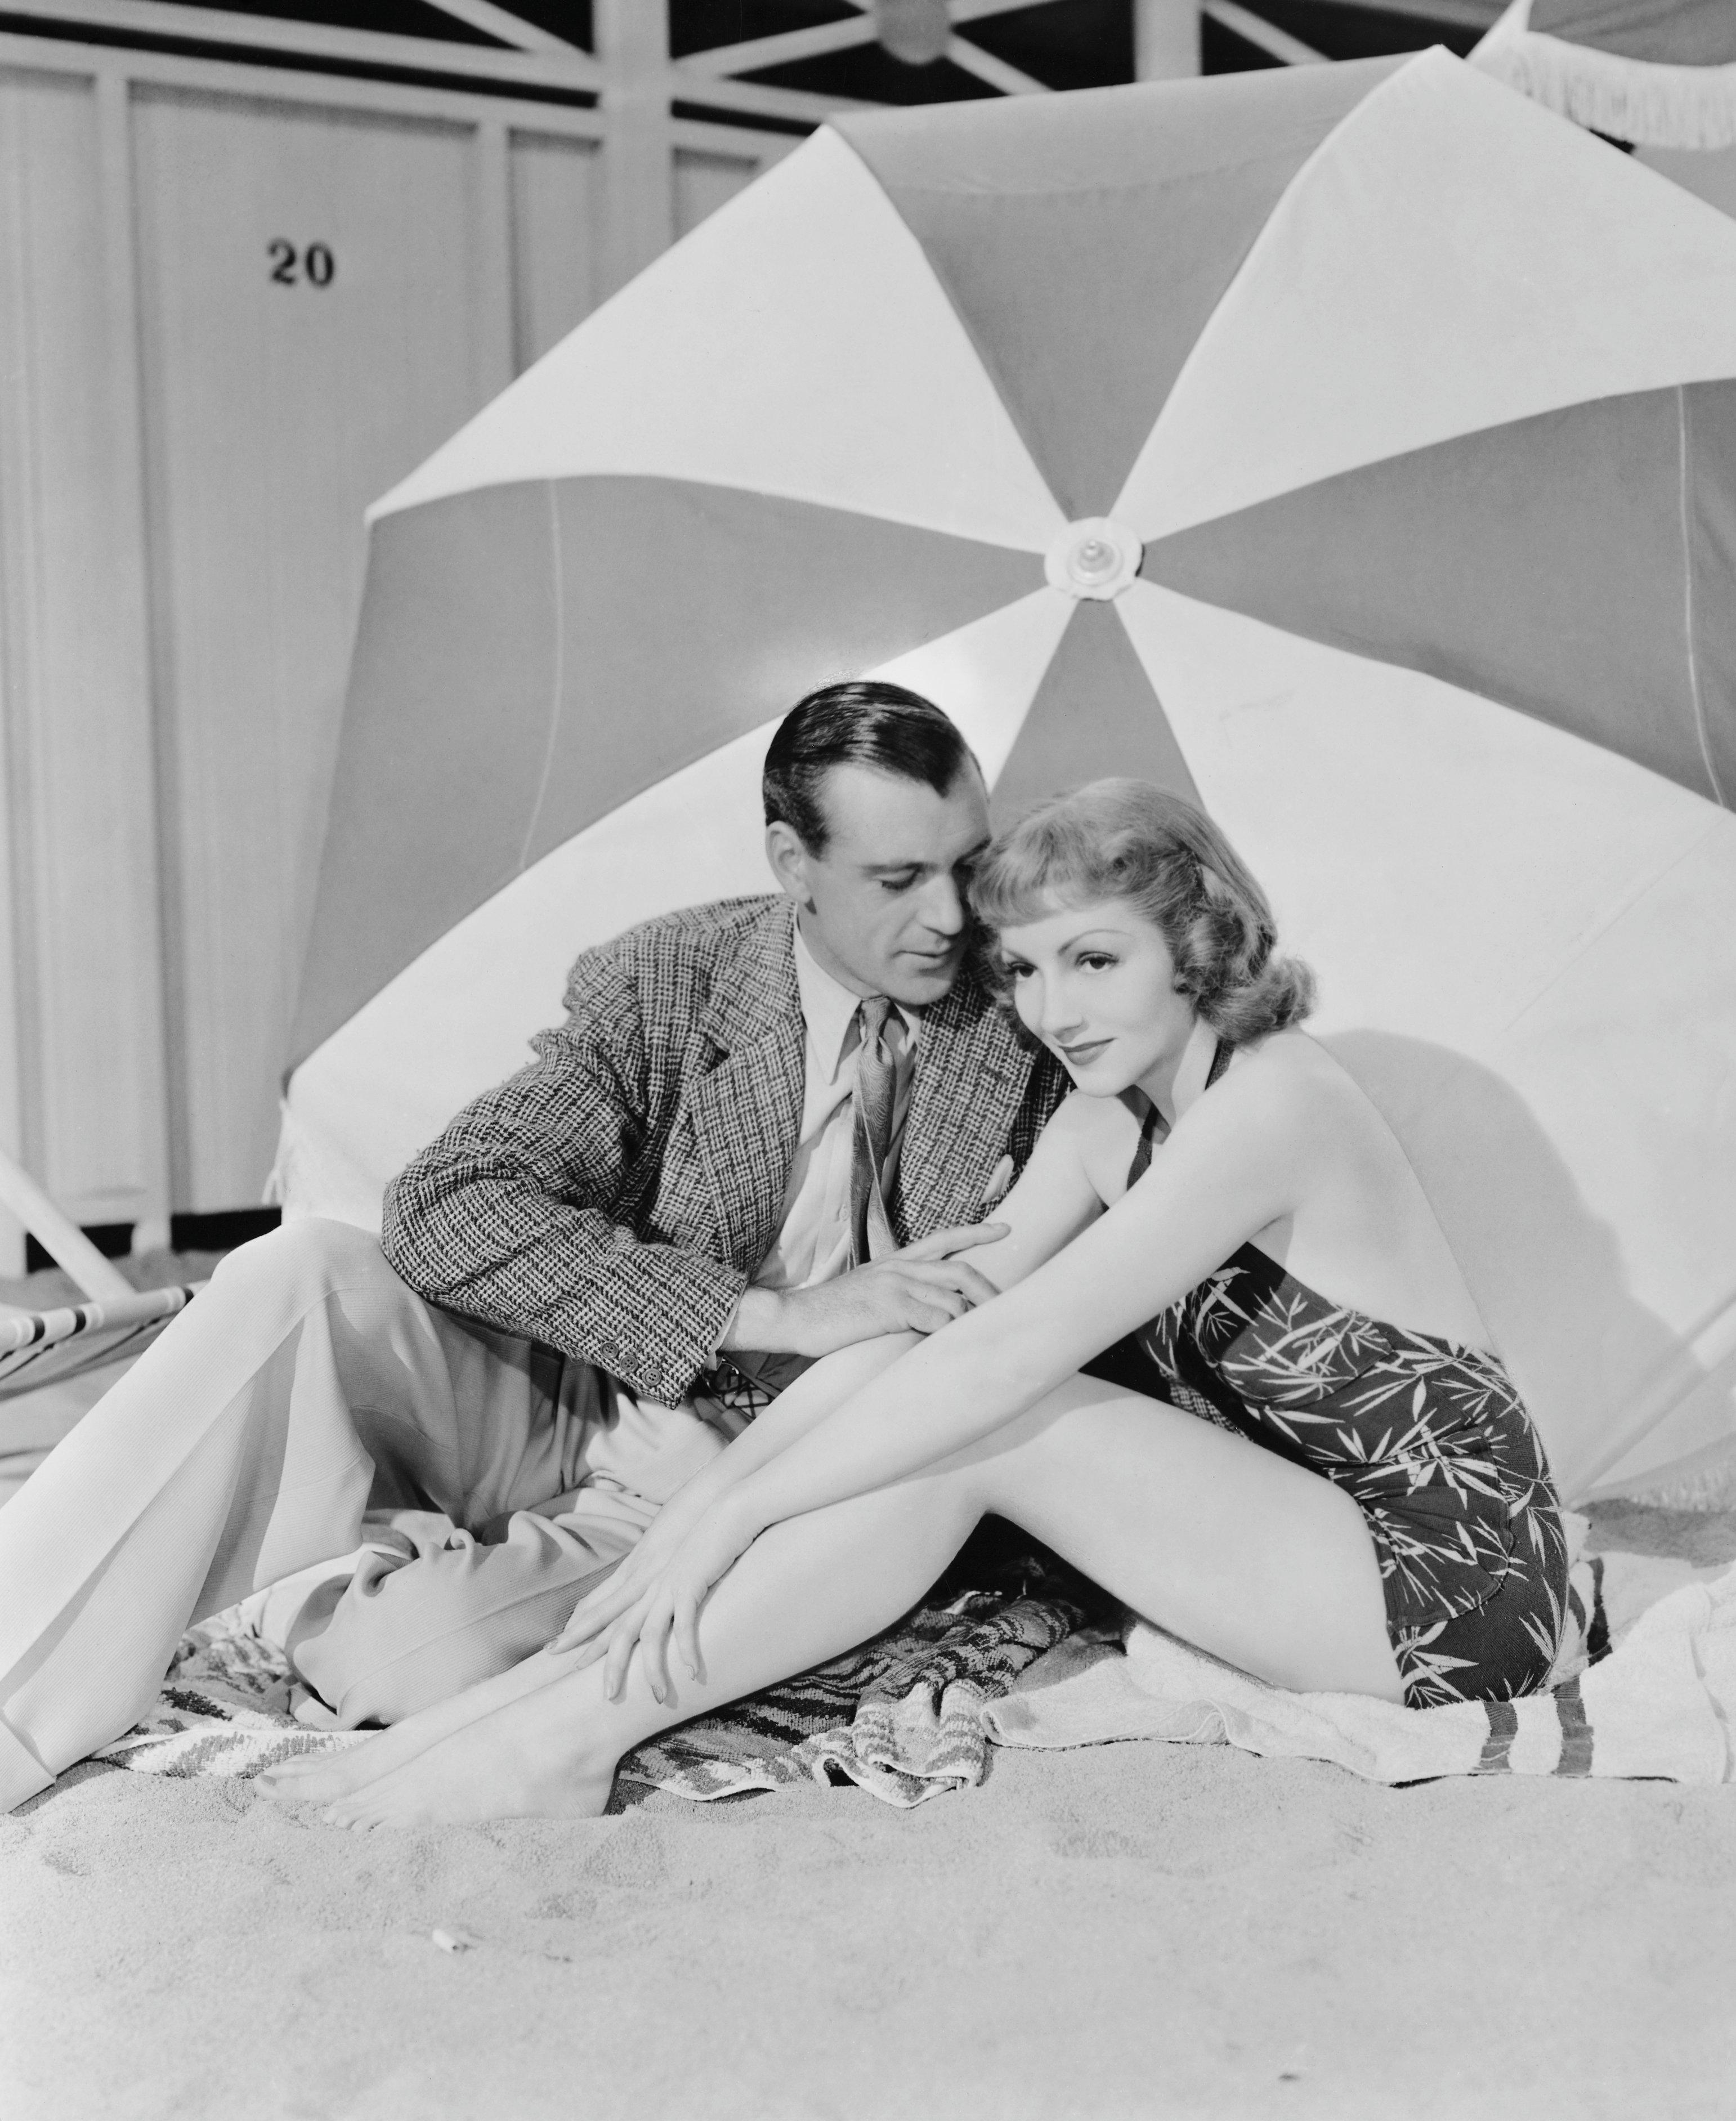 Gary Cooper and Claudette Colbert Seated Under Umbrella